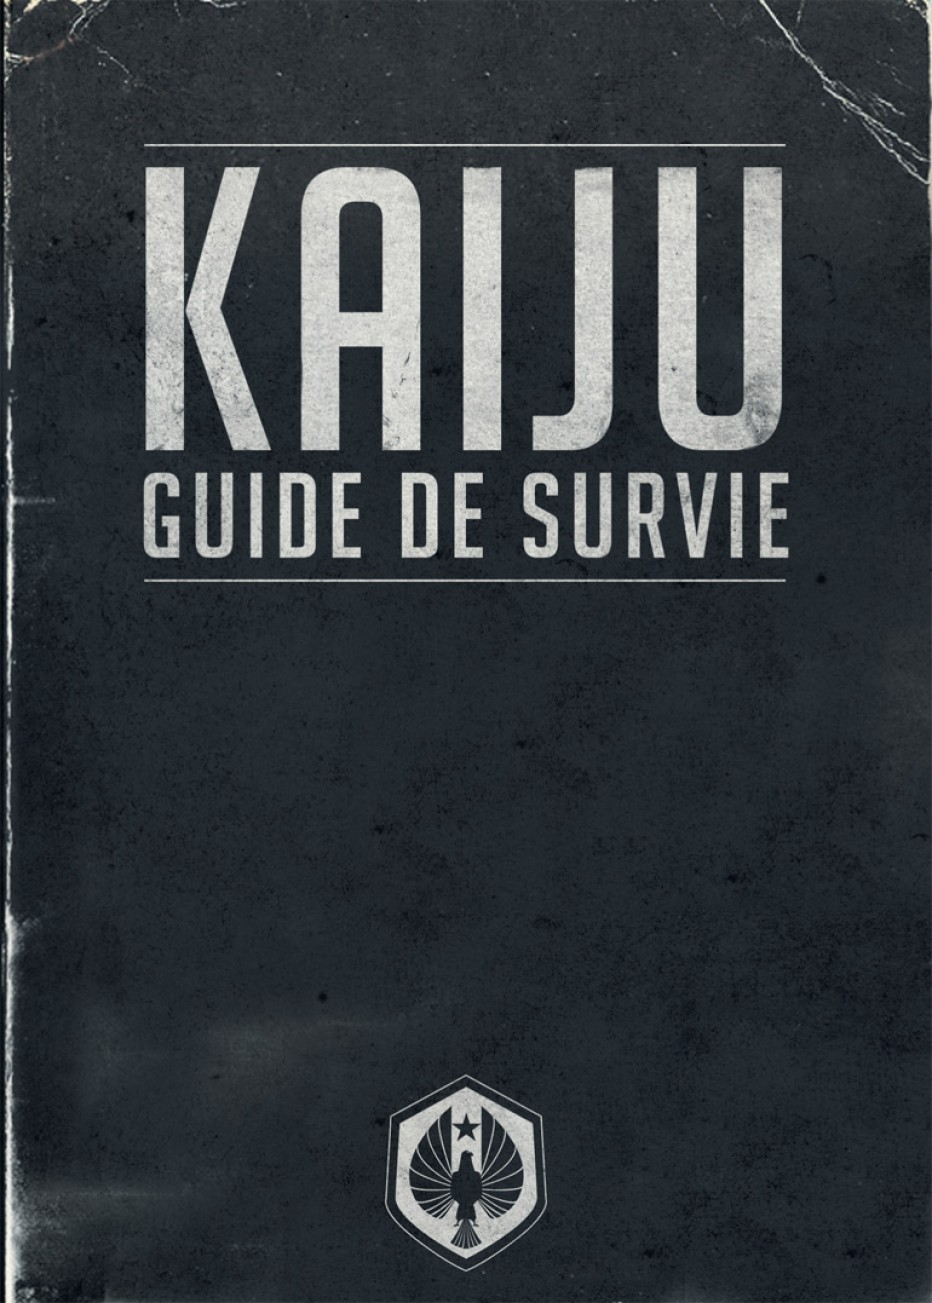 KAIJU, guide de survie